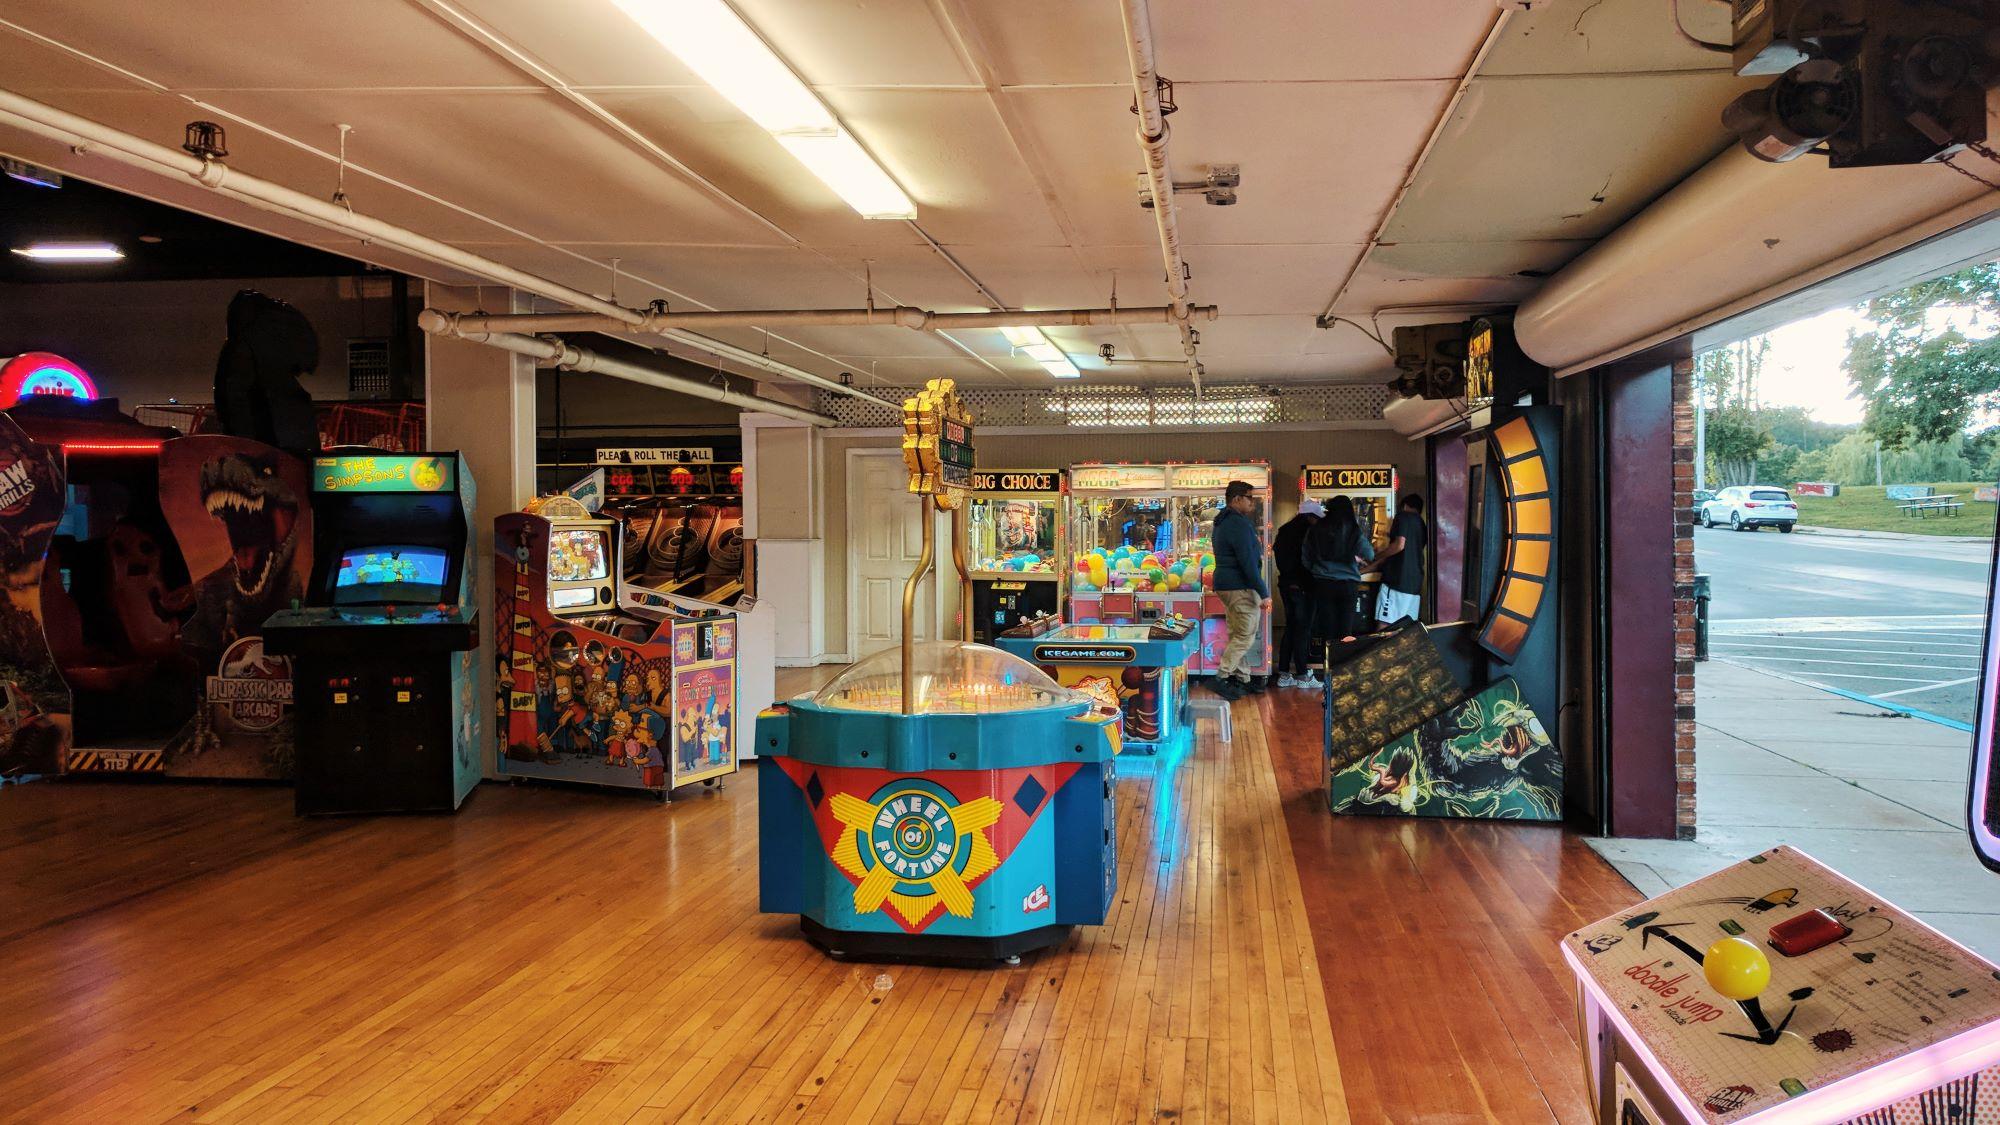 Salem Willows Arcade interior